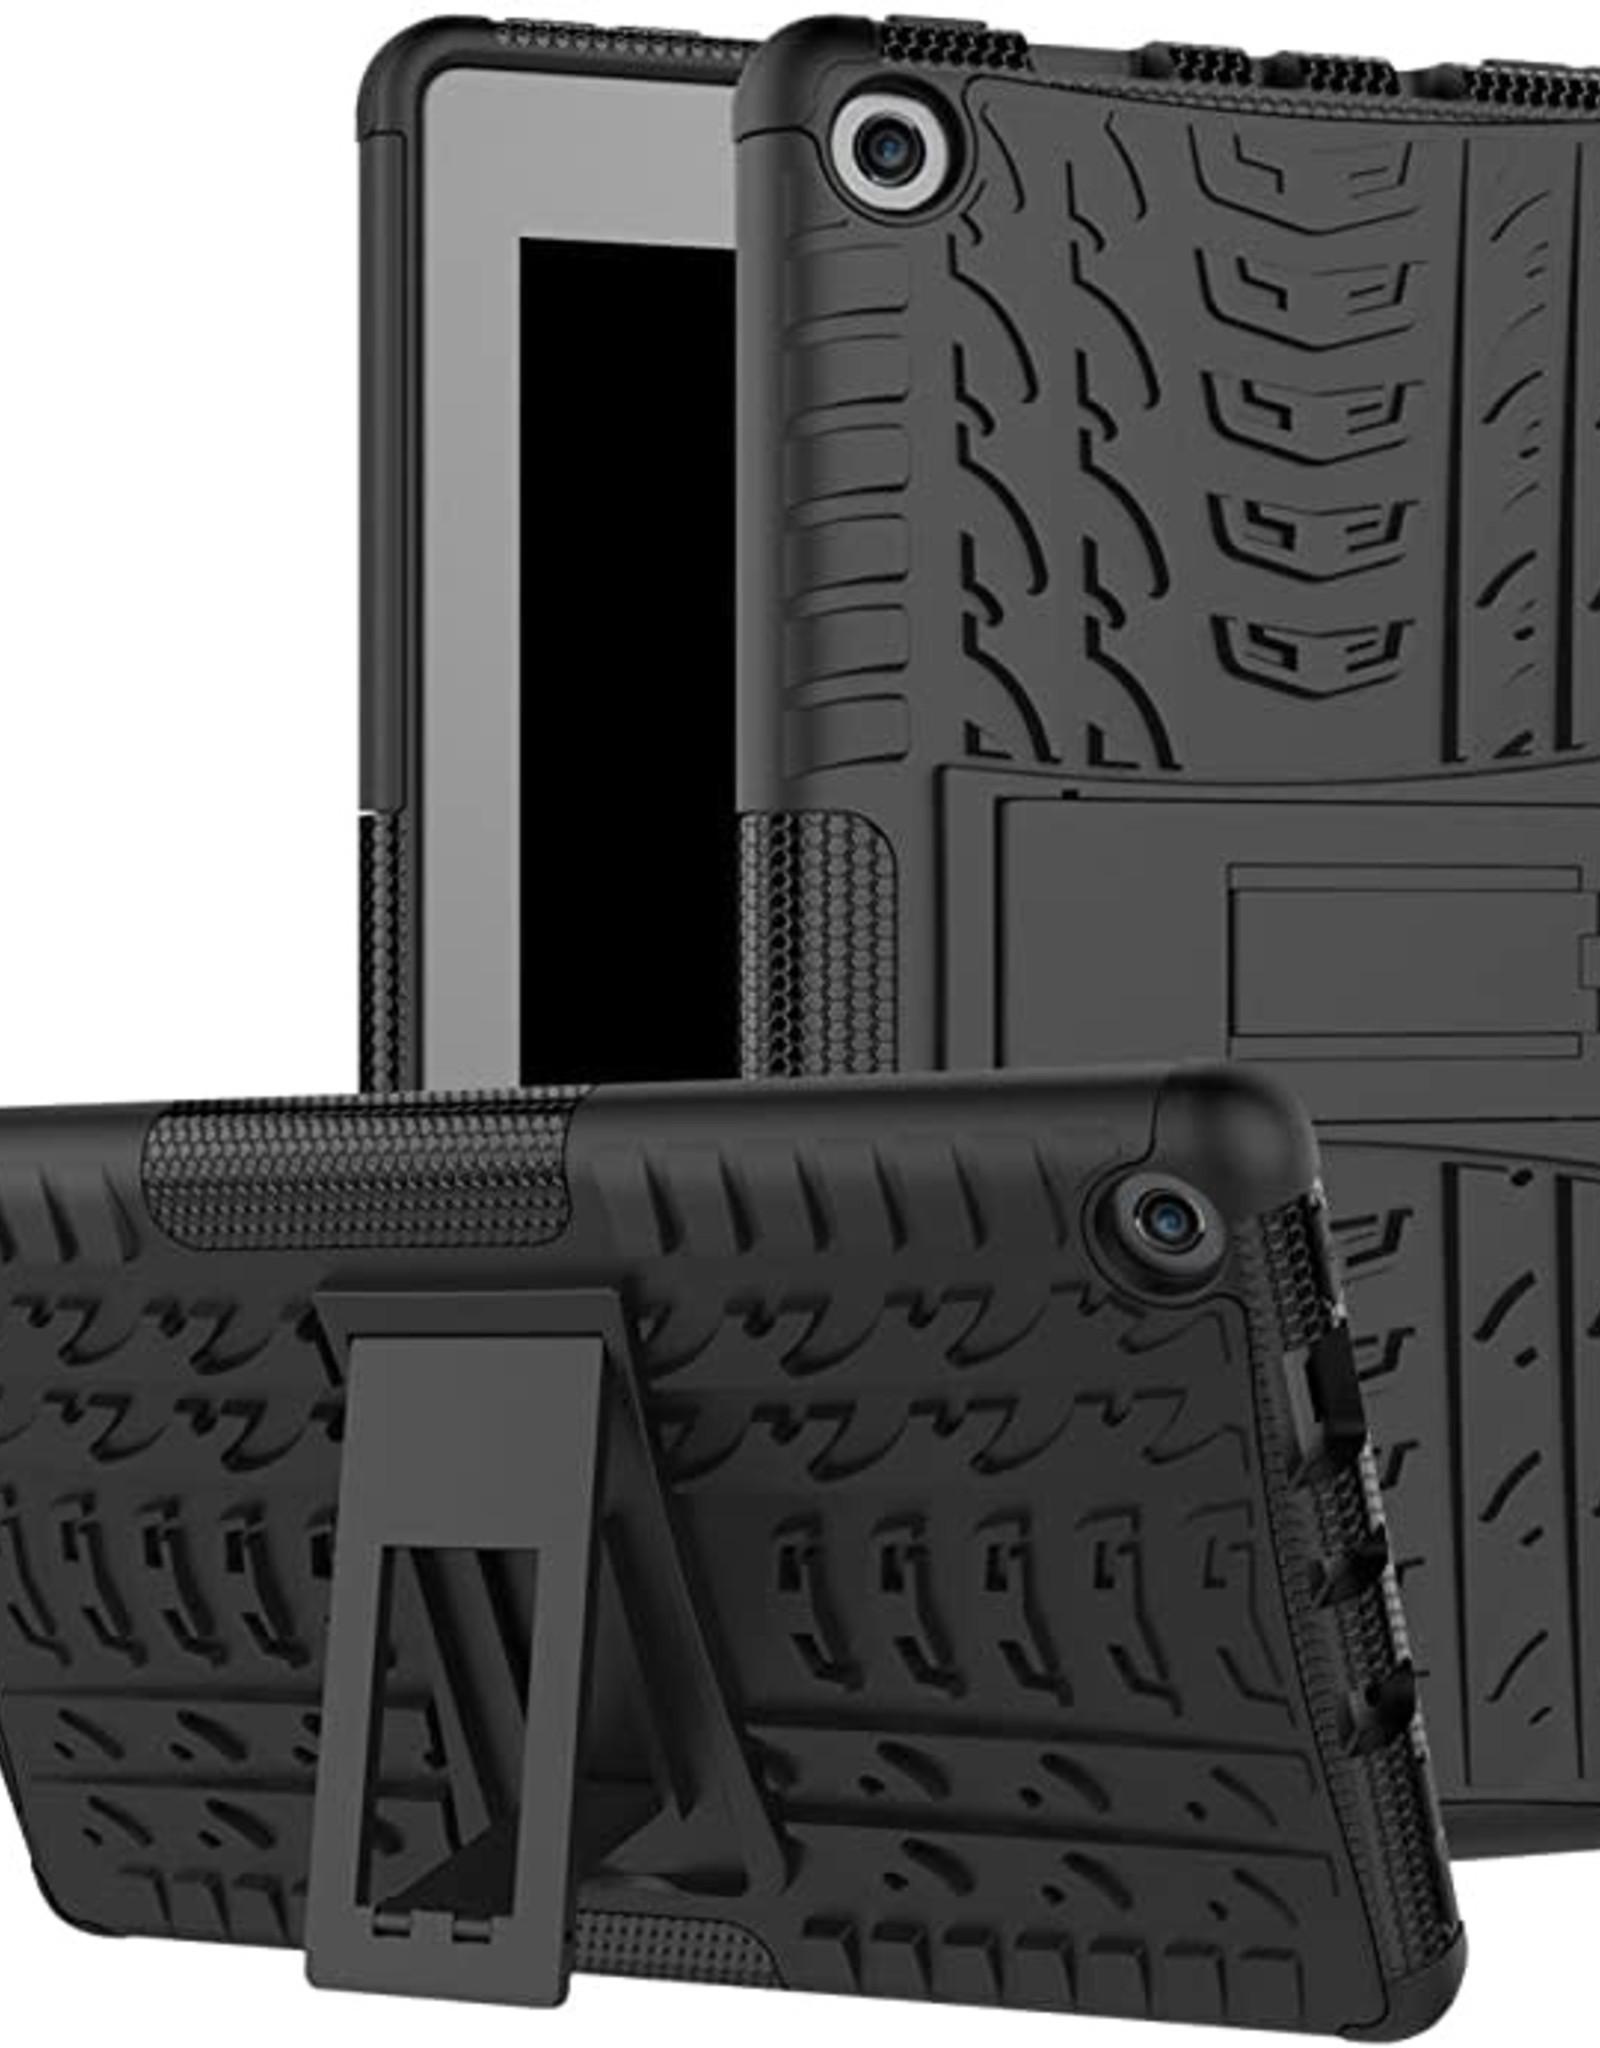 Amazon Defender Tablet Case - Amazon Fire ( 7 inch )